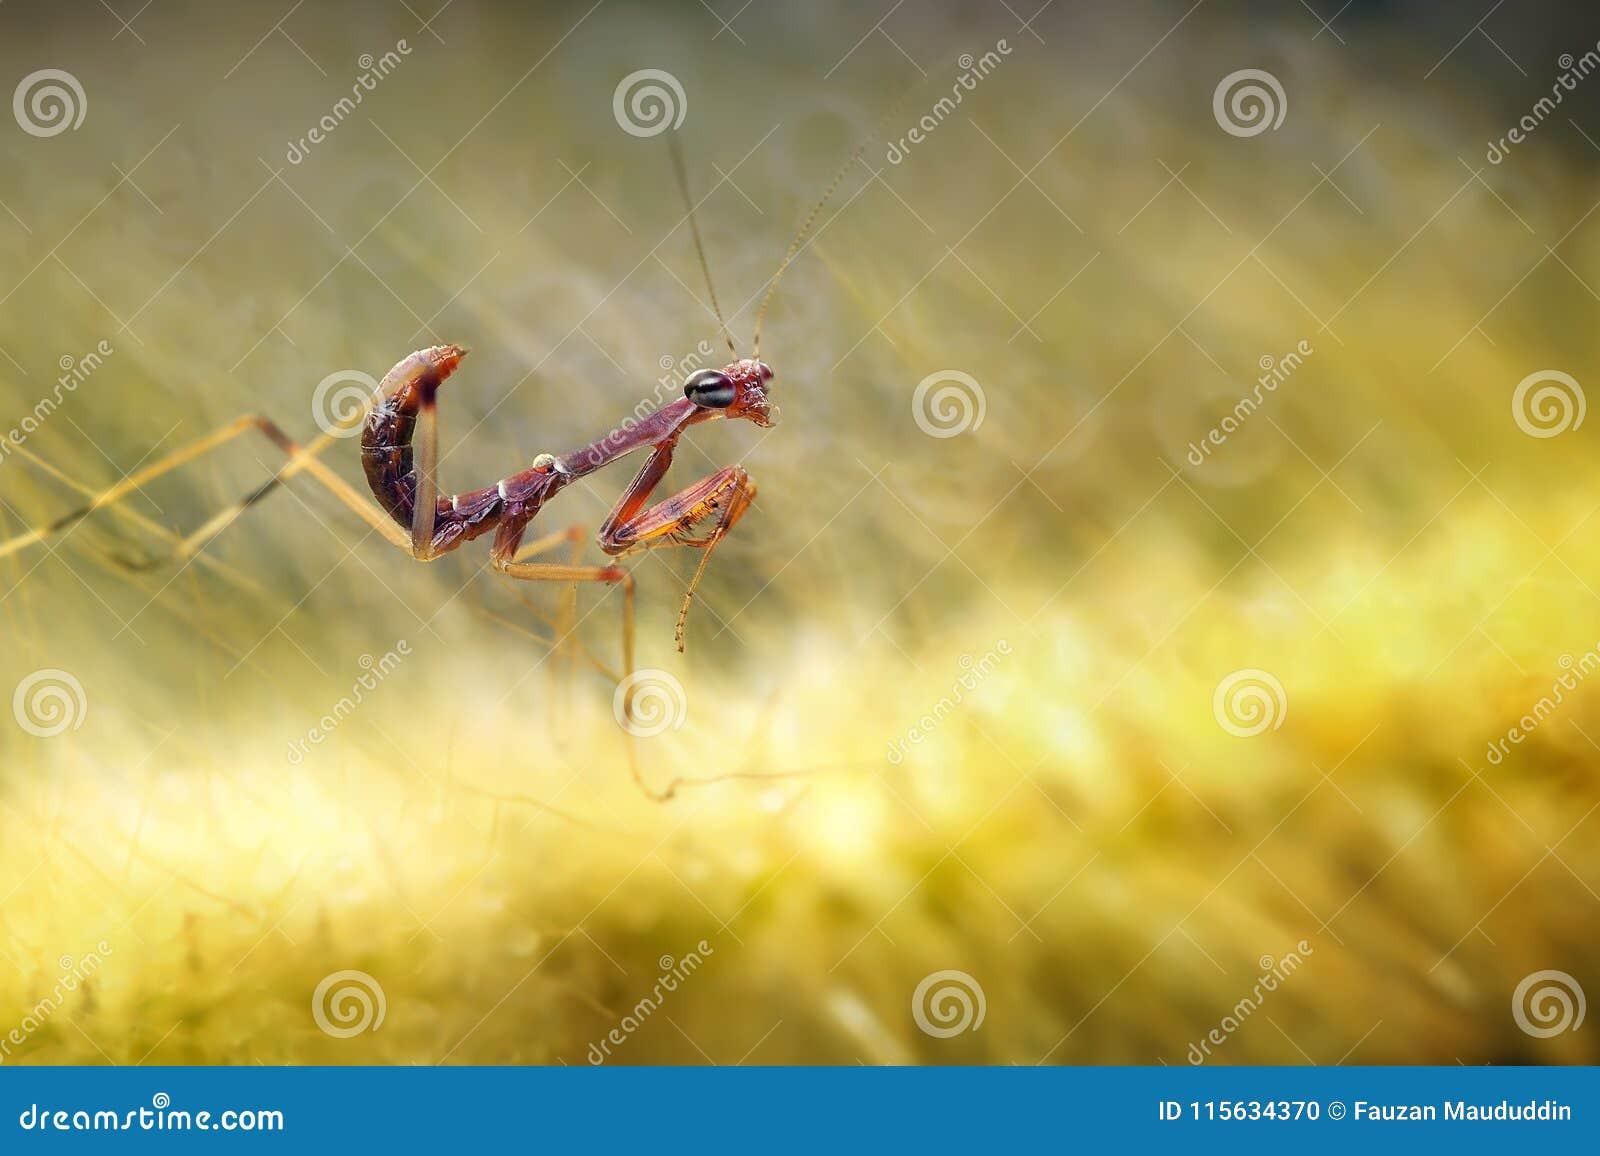 Cute Baby Mantis